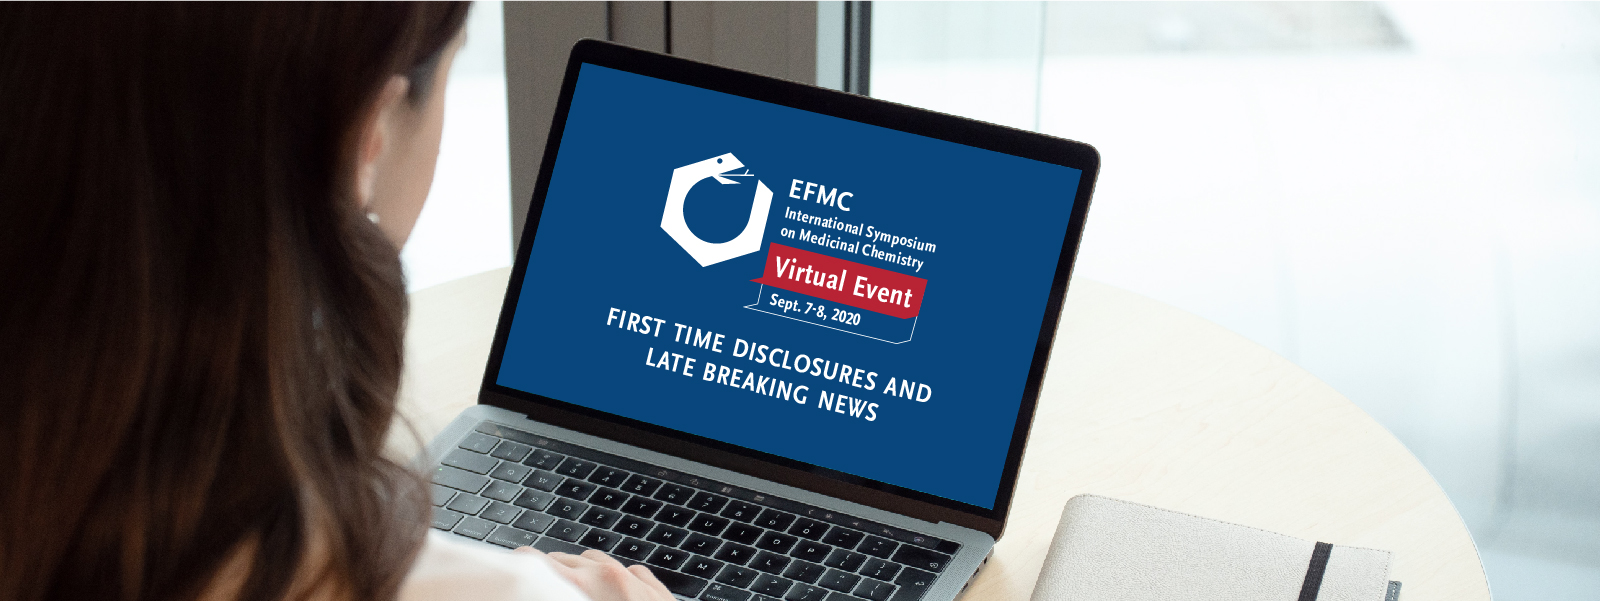 NovAliX at EFMC-ISMC Virtual Event 2020 | 7 – 8 September 2020